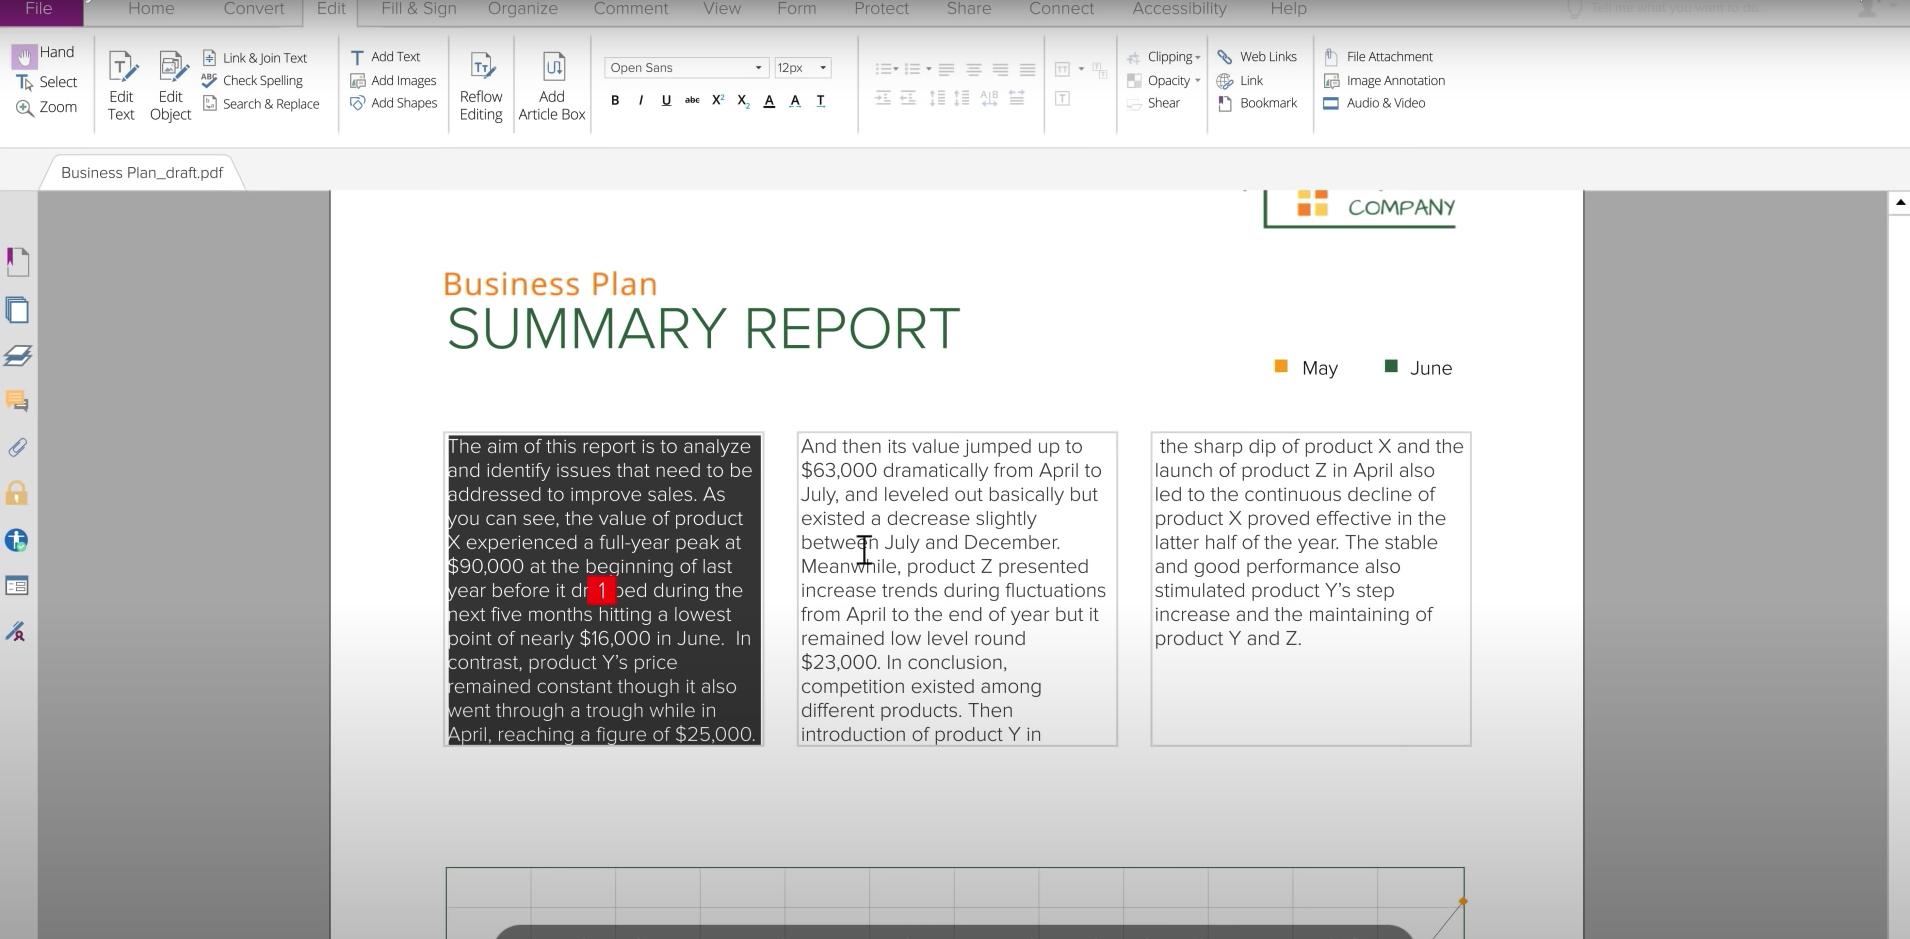 Foxit PhantomPDF - edit document